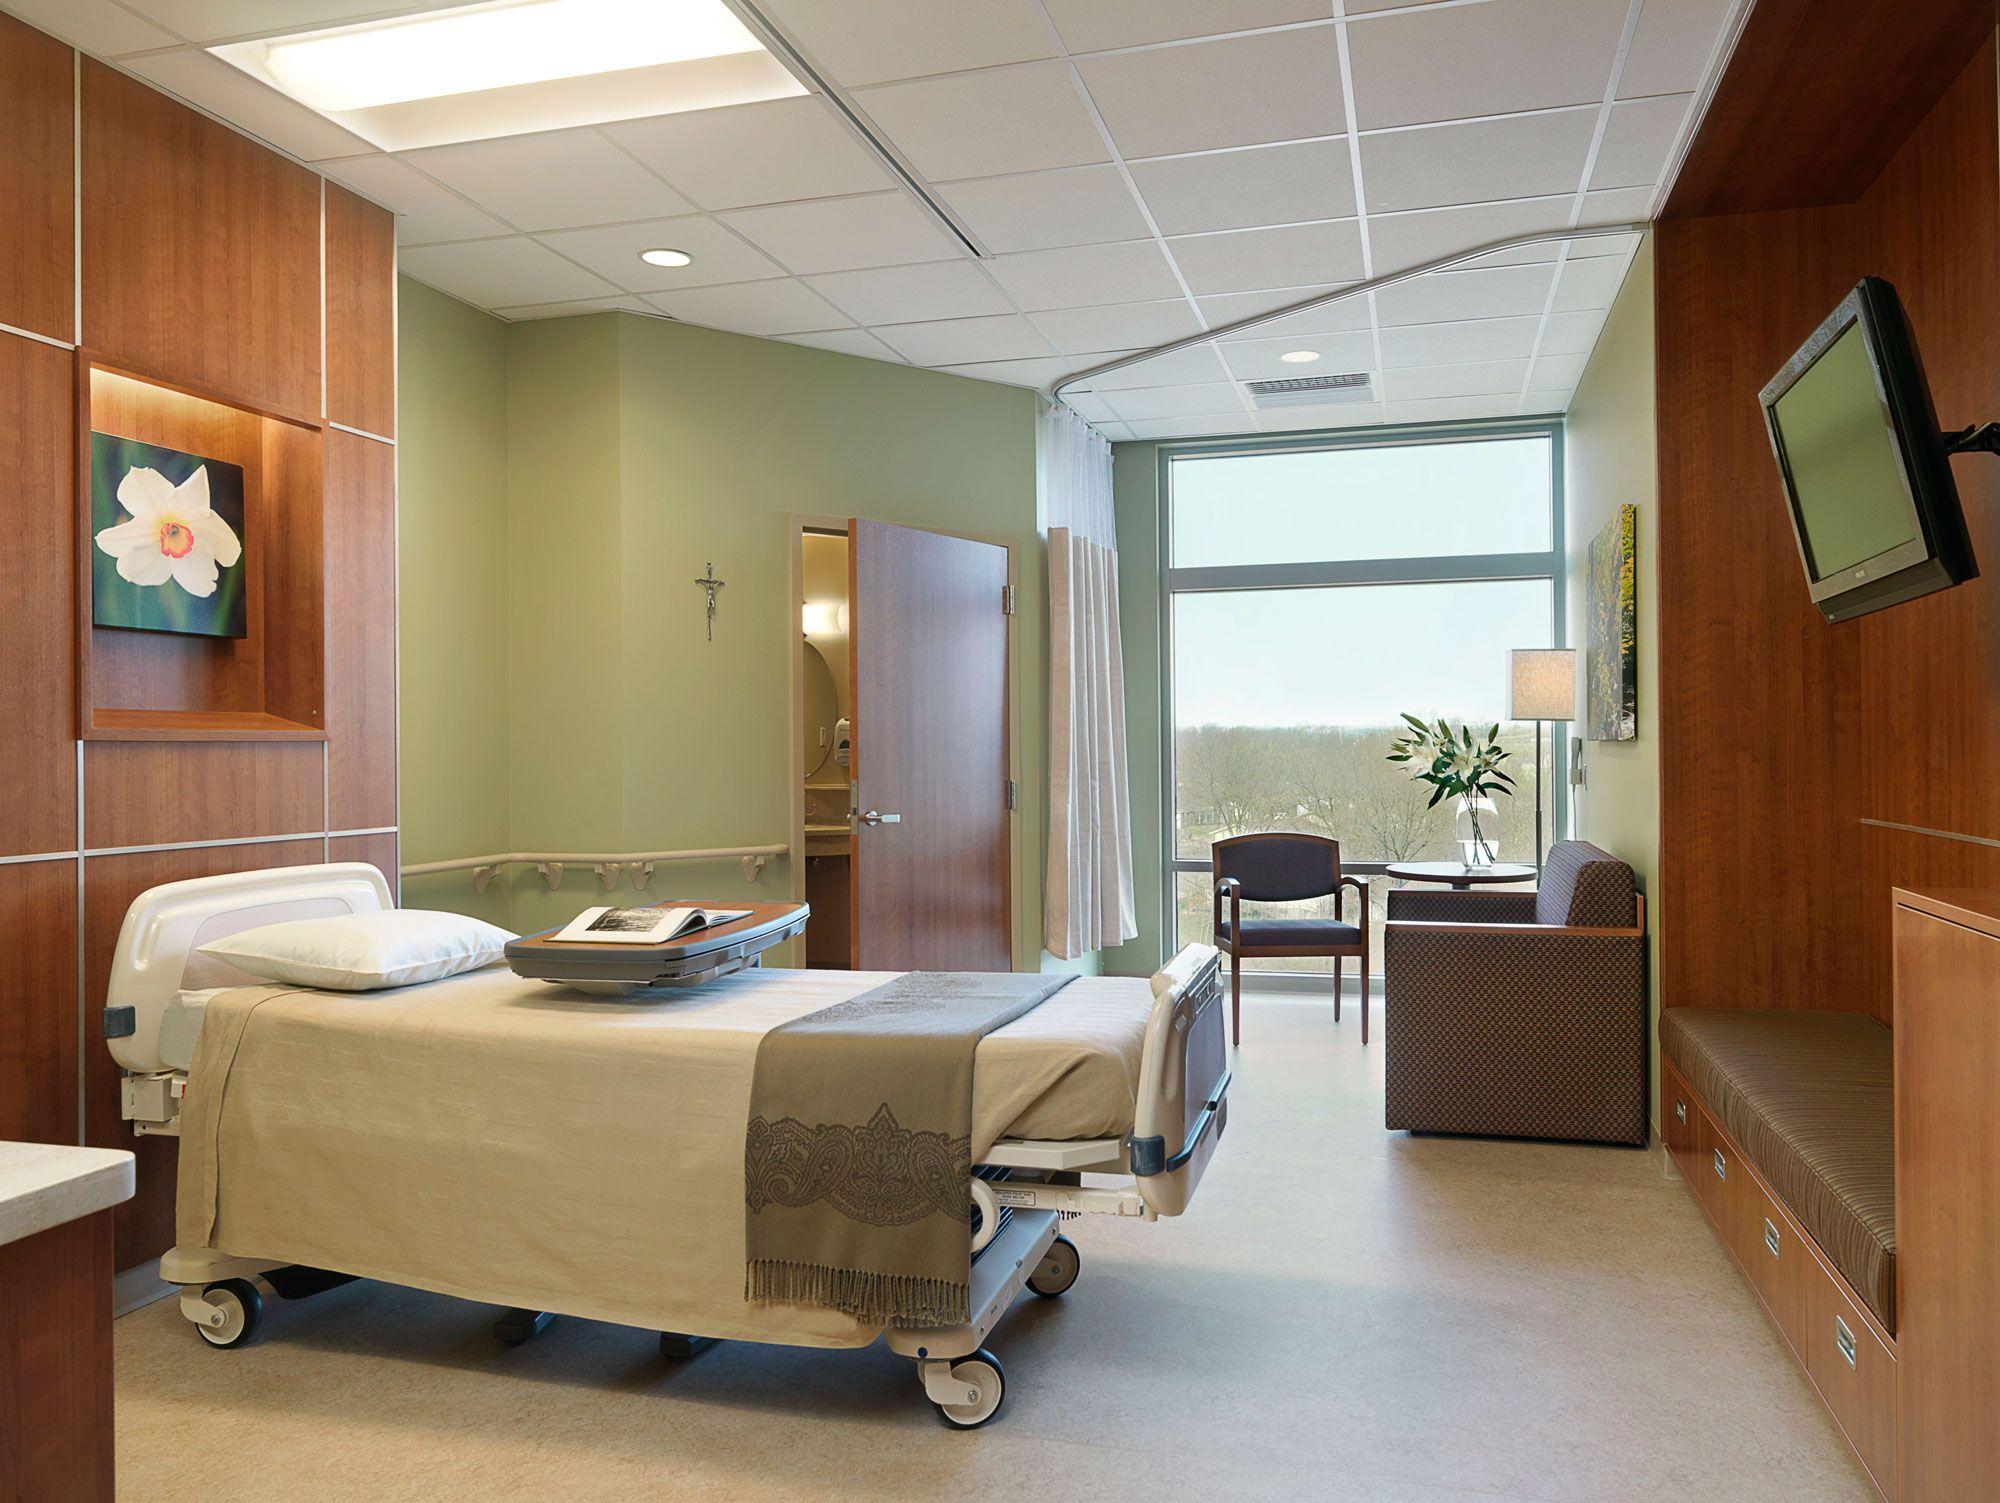 Patient Room Id 265 Hospital In 2019 Healthcare